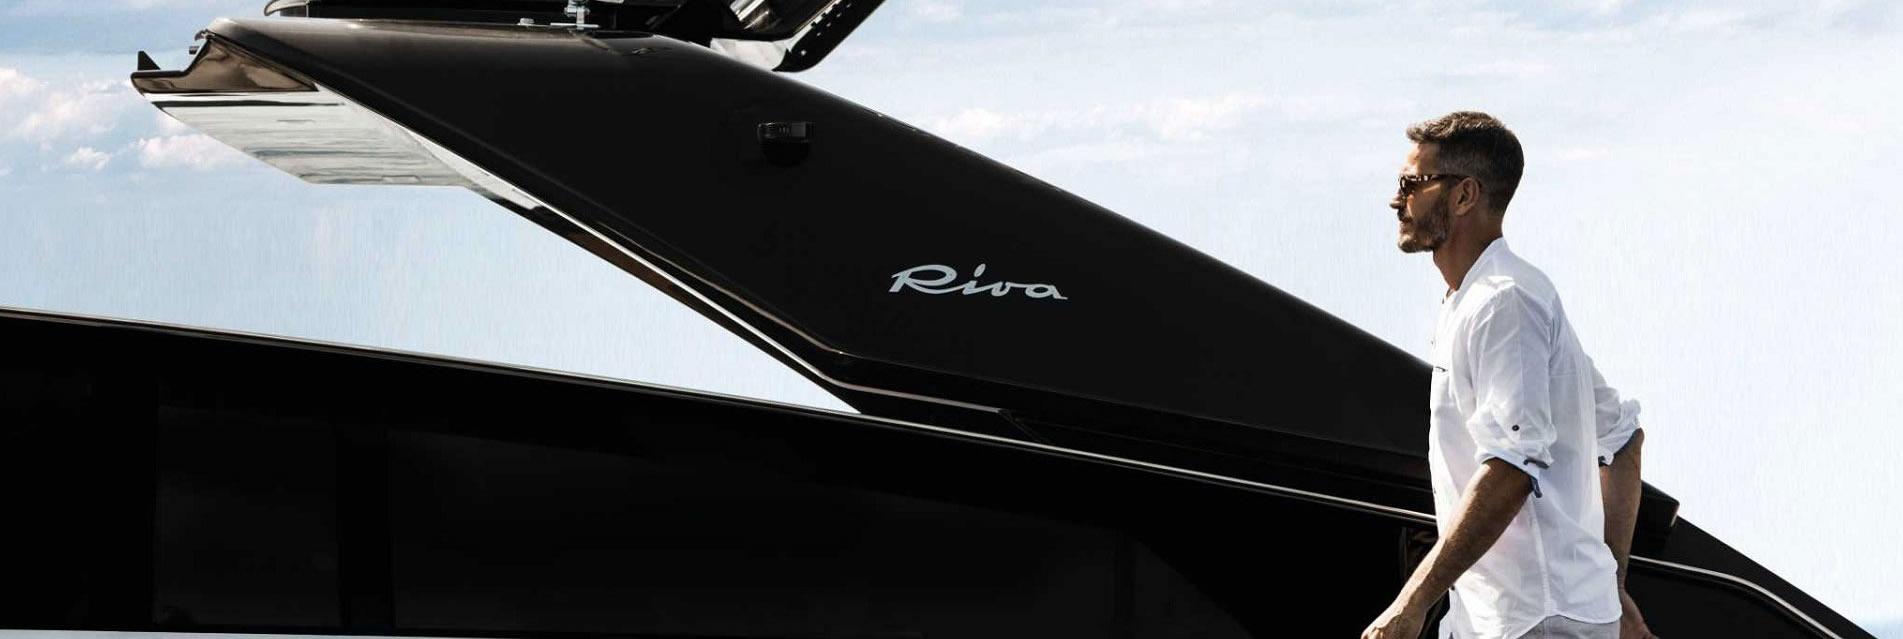 Riva-open-Runabouts-Modelluebersicht